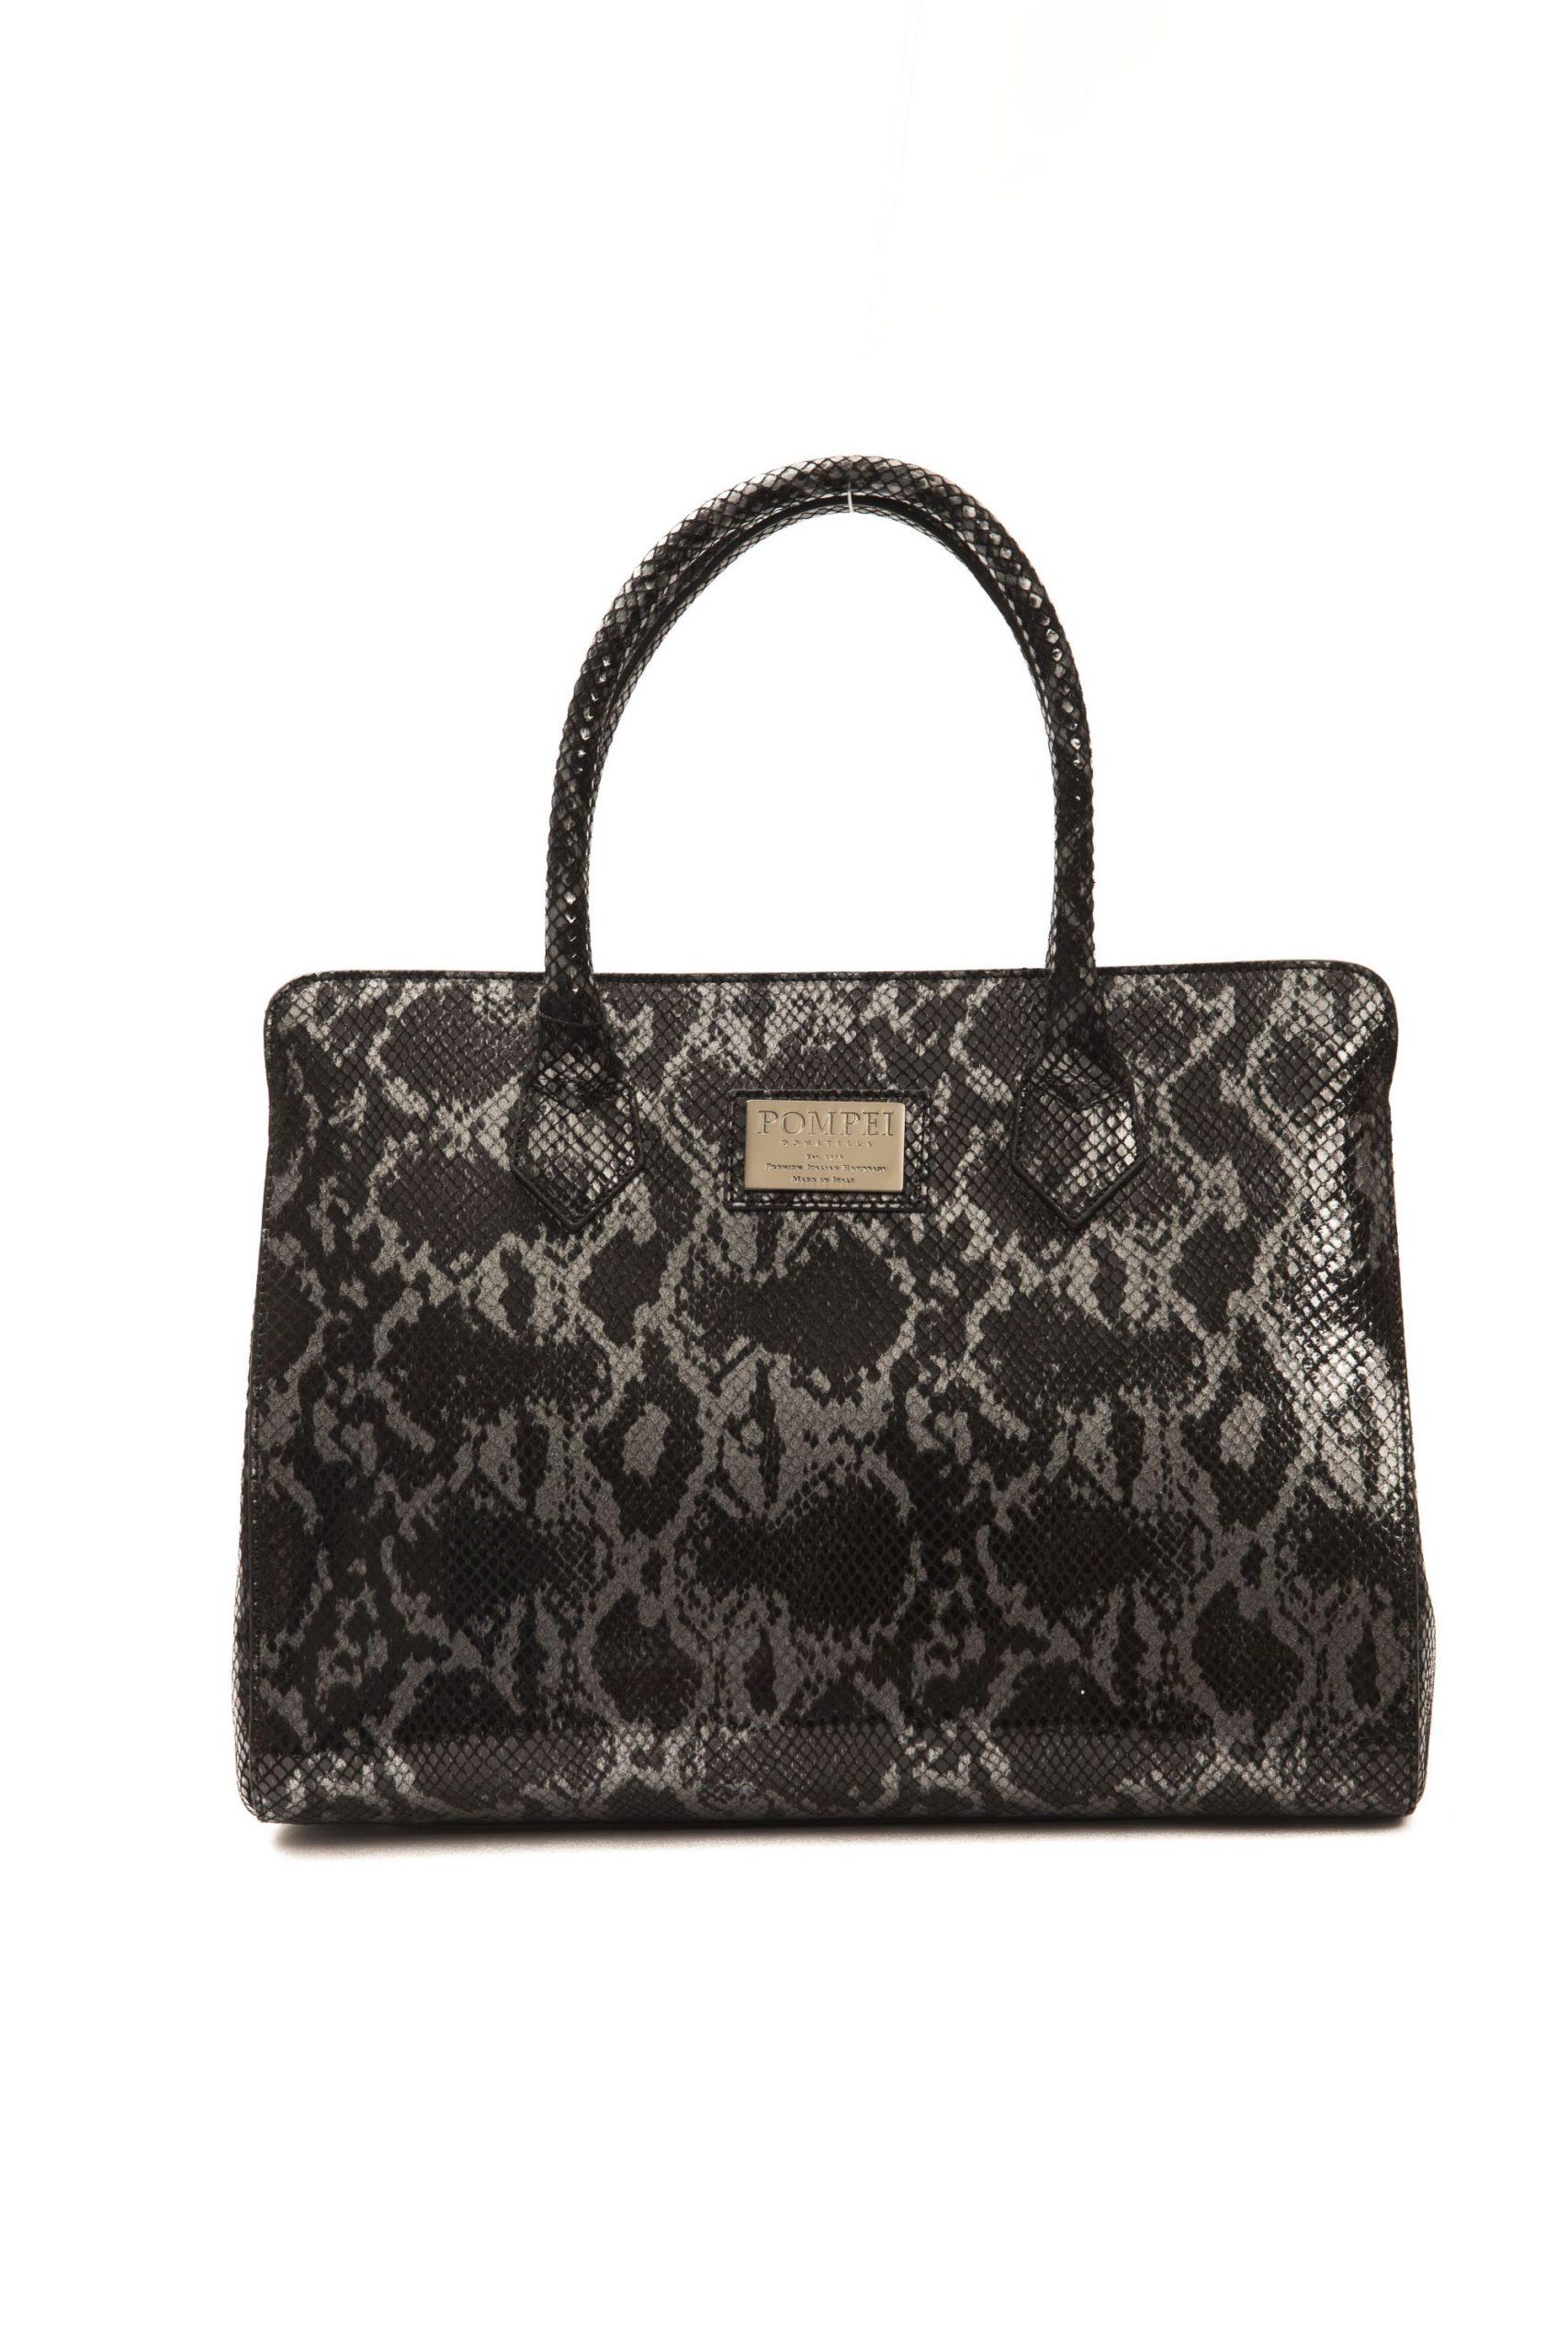 Pompei Donatella Women's Handbag Grey PO667826